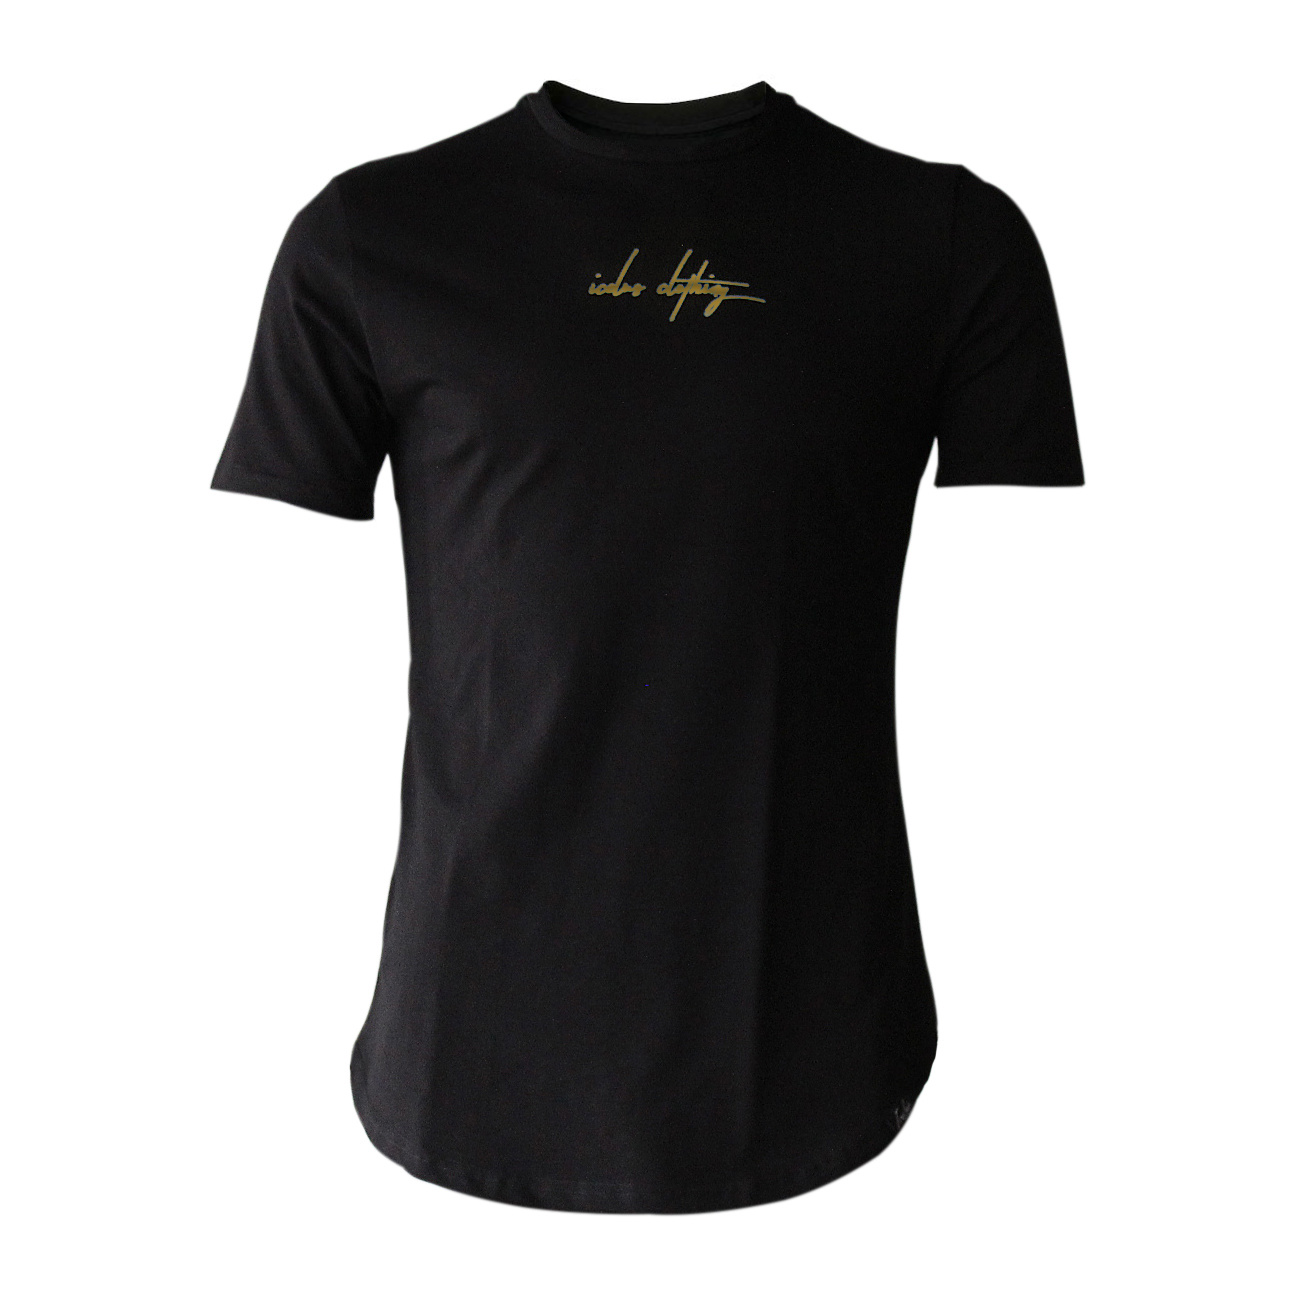 Icelus Clothing Maison Series Gold on Black